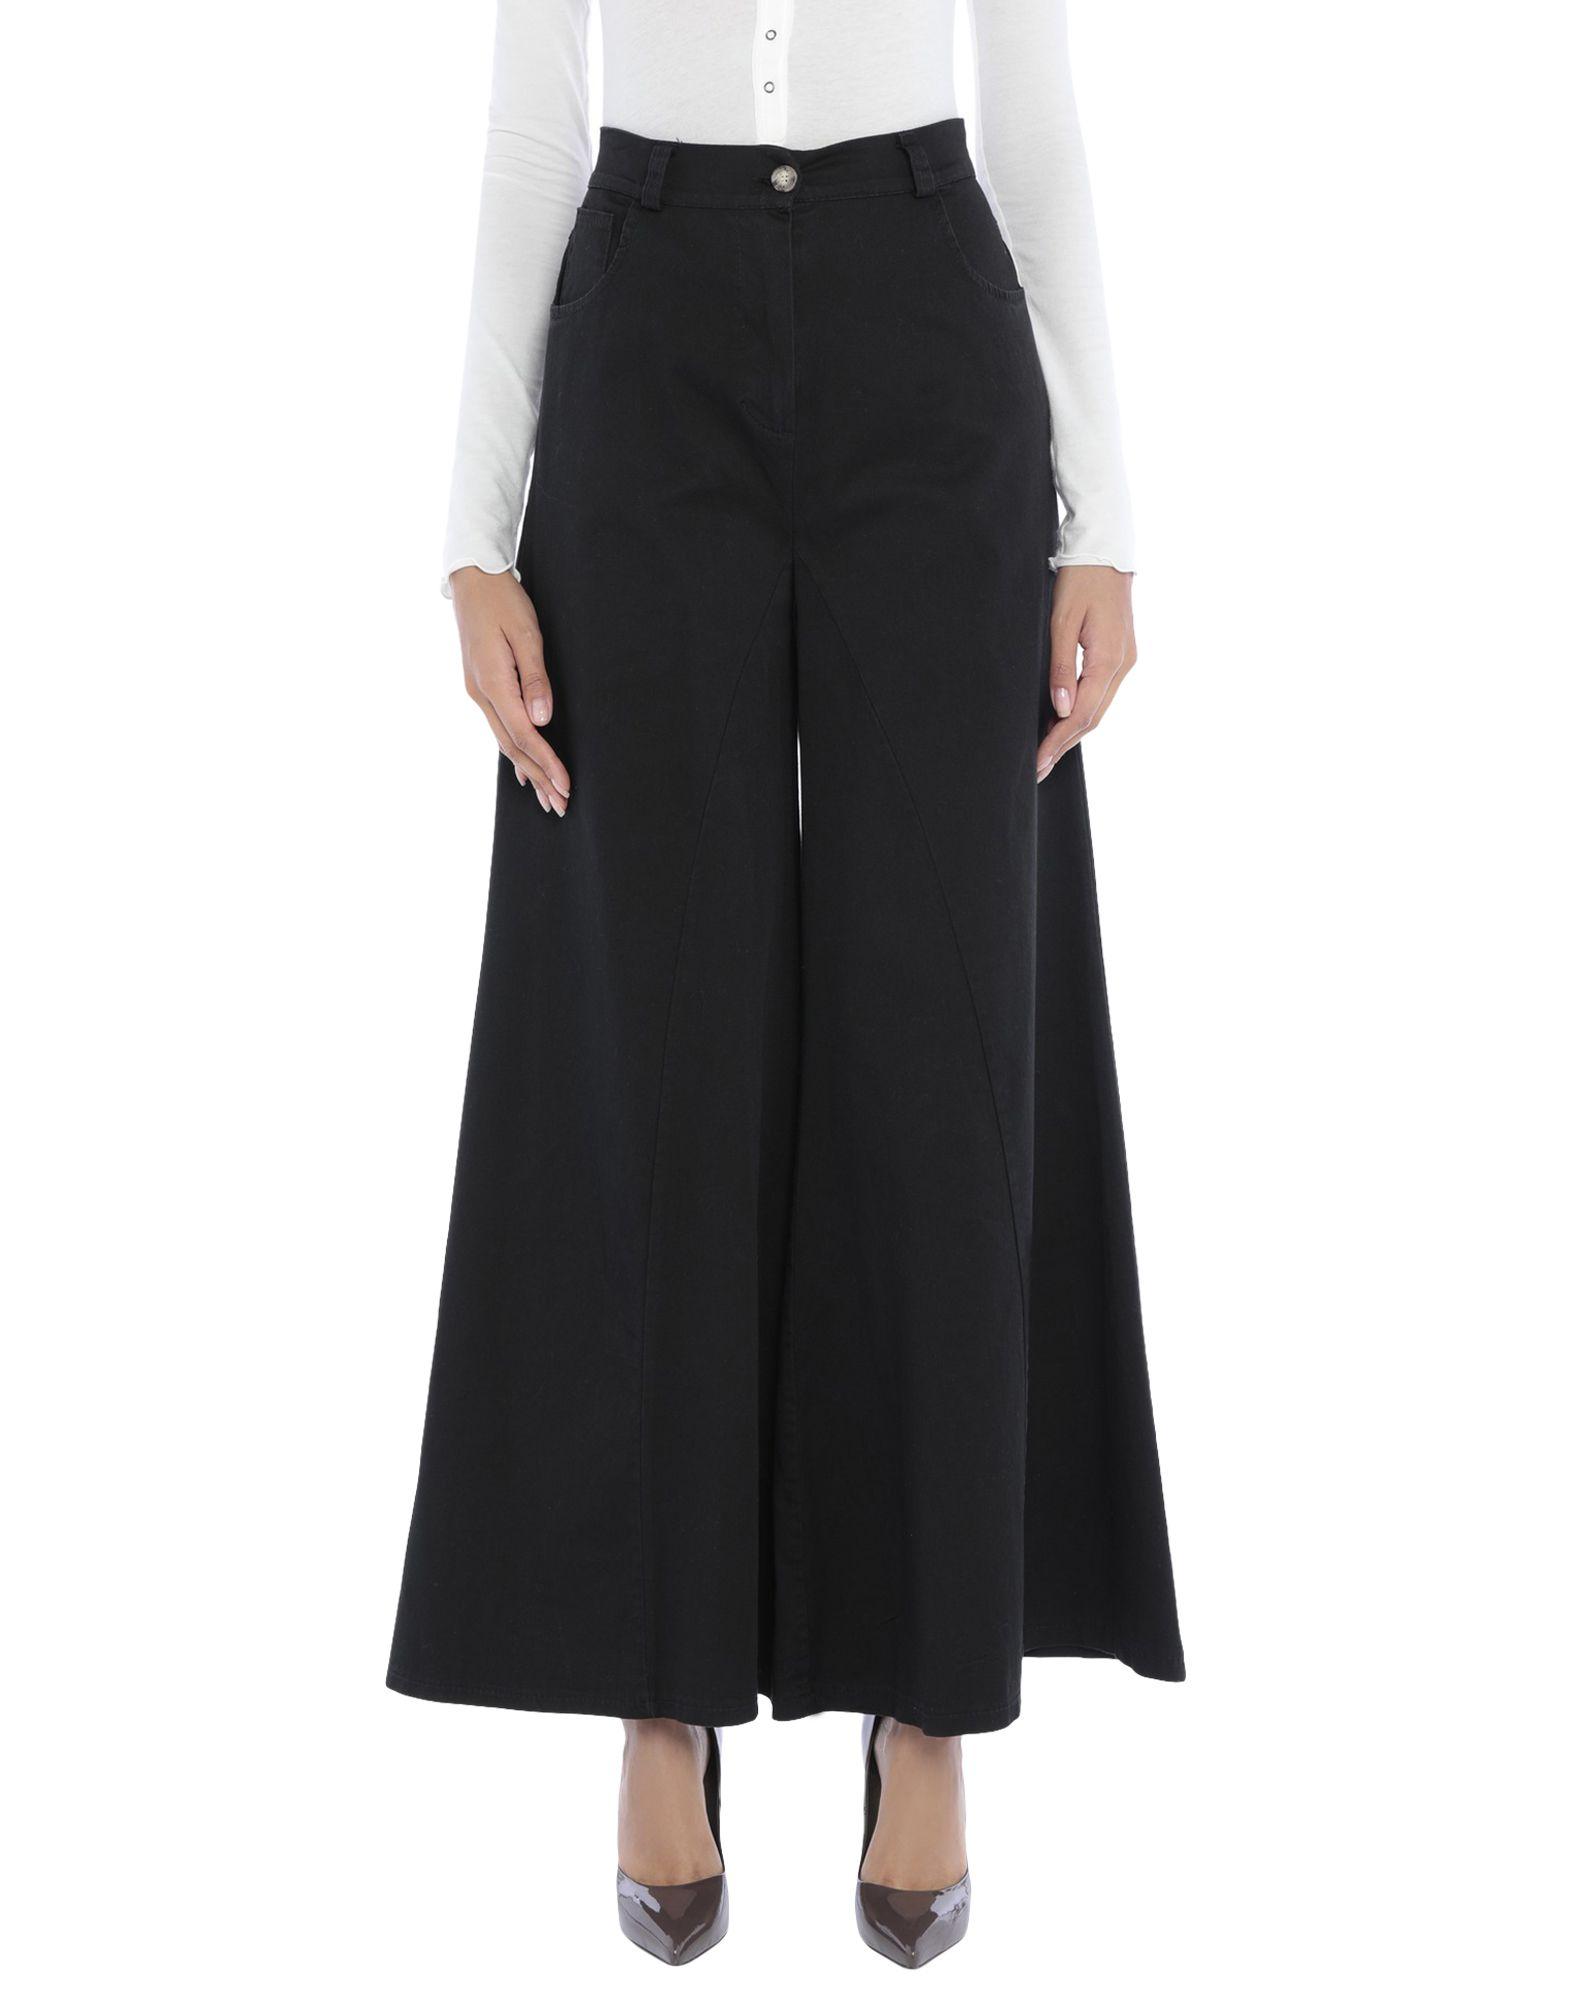 цена на OUVERT DIMANCHE Повседневные брюки